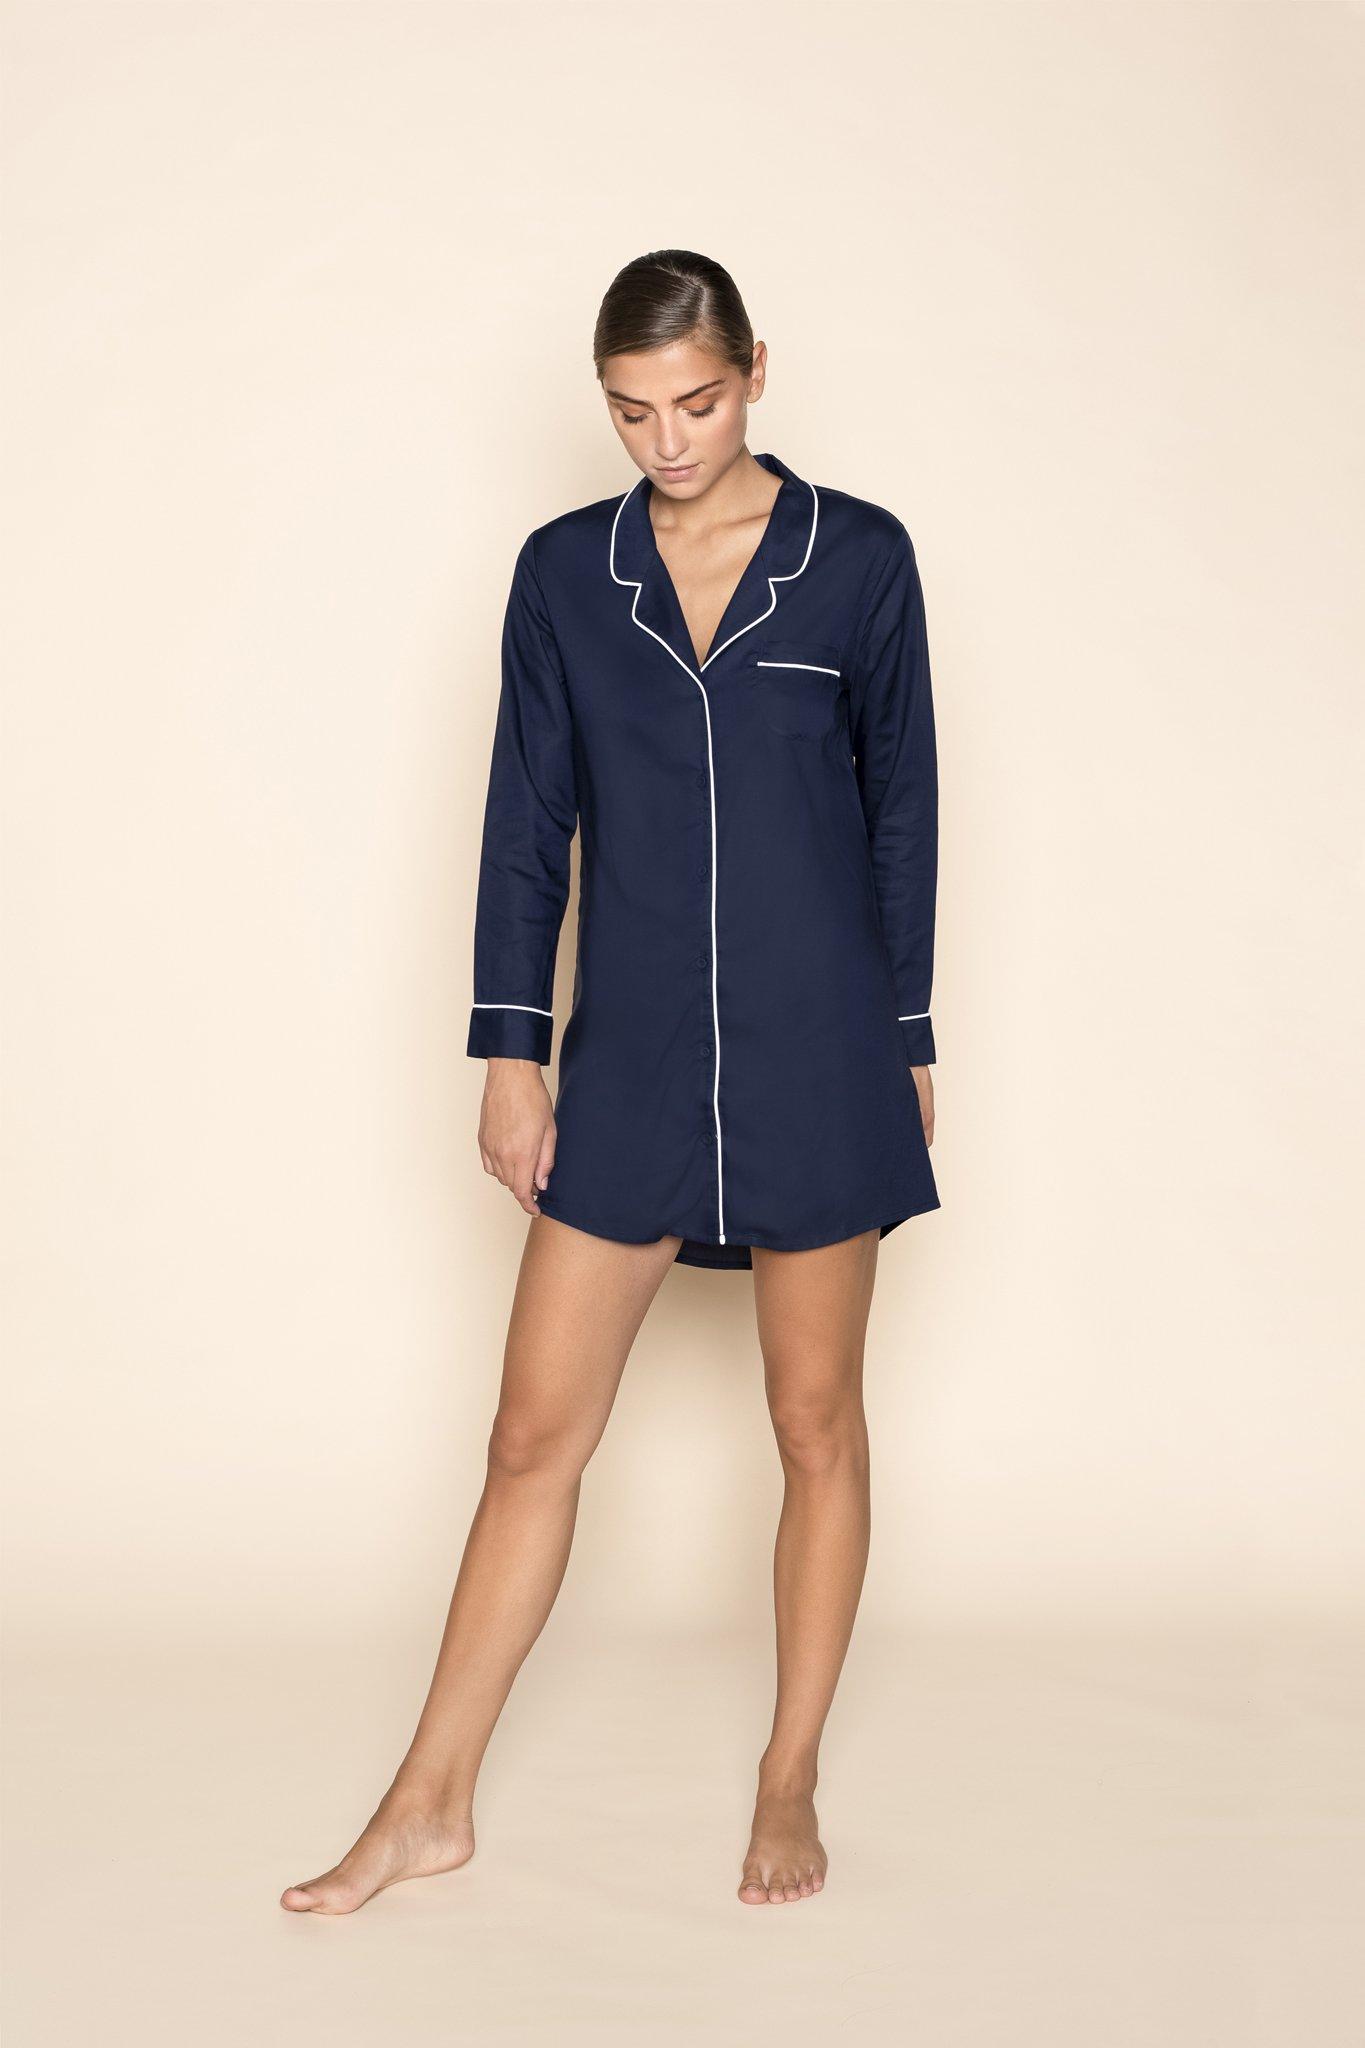 Le Nap Dress blouse - After Dark